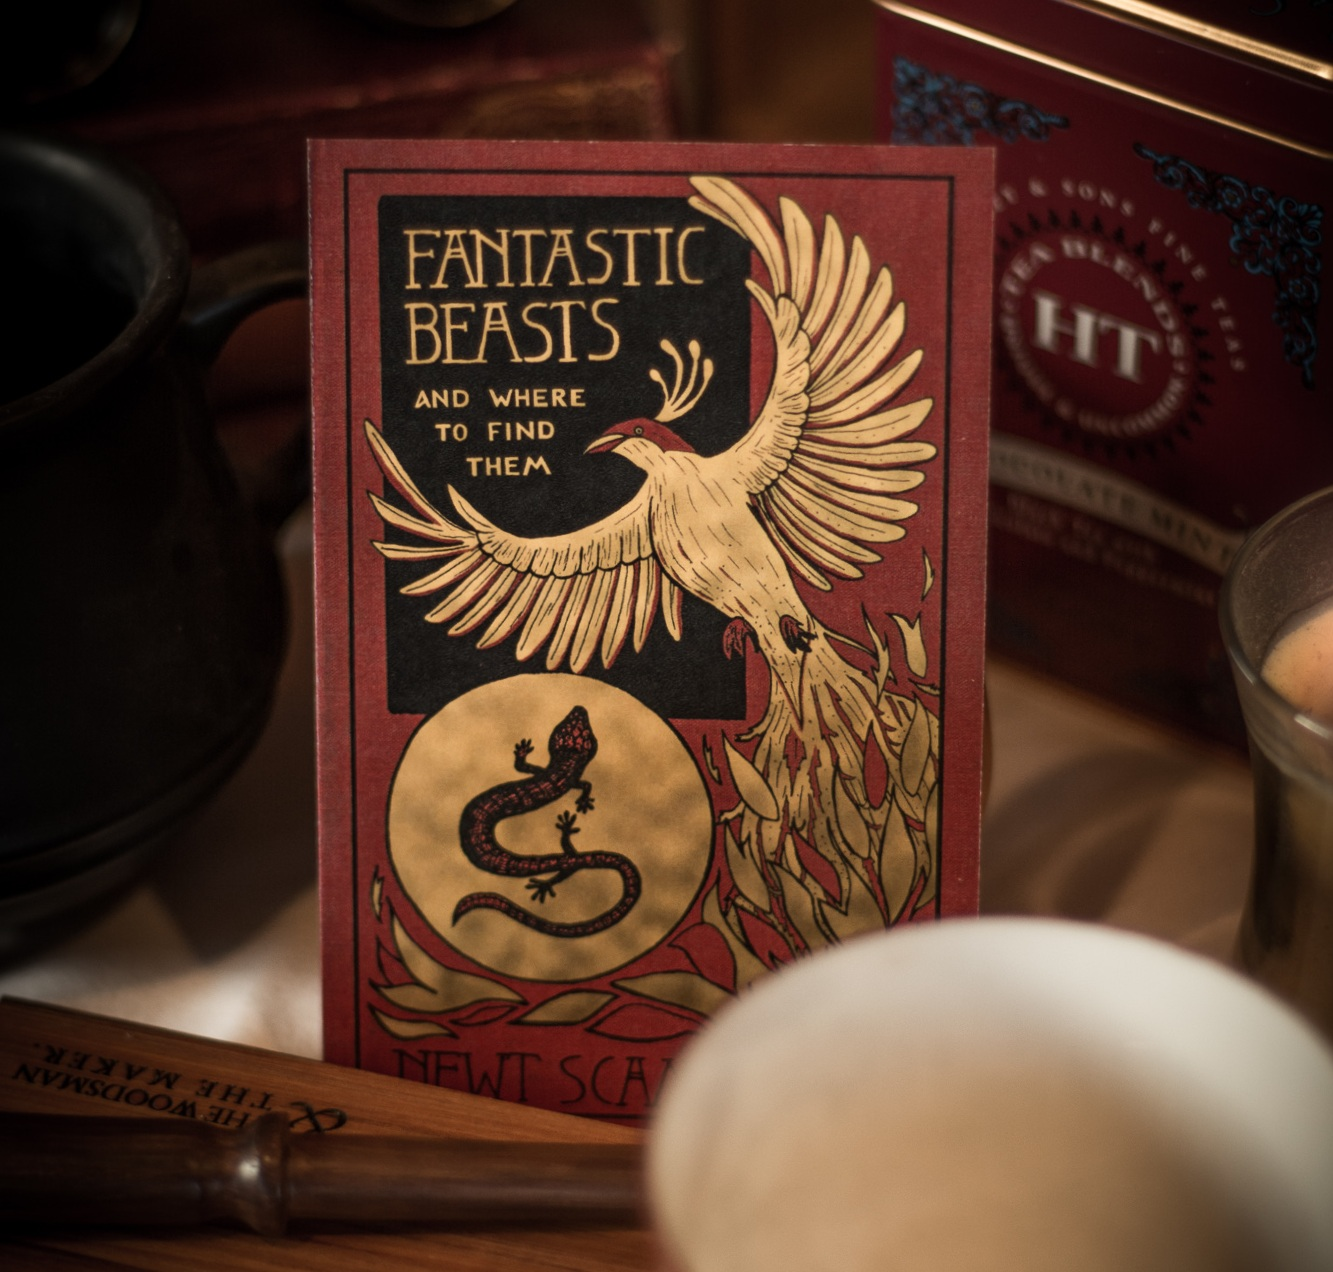 fantastic_beasts_book_cover_holly_dunn_design.jpg